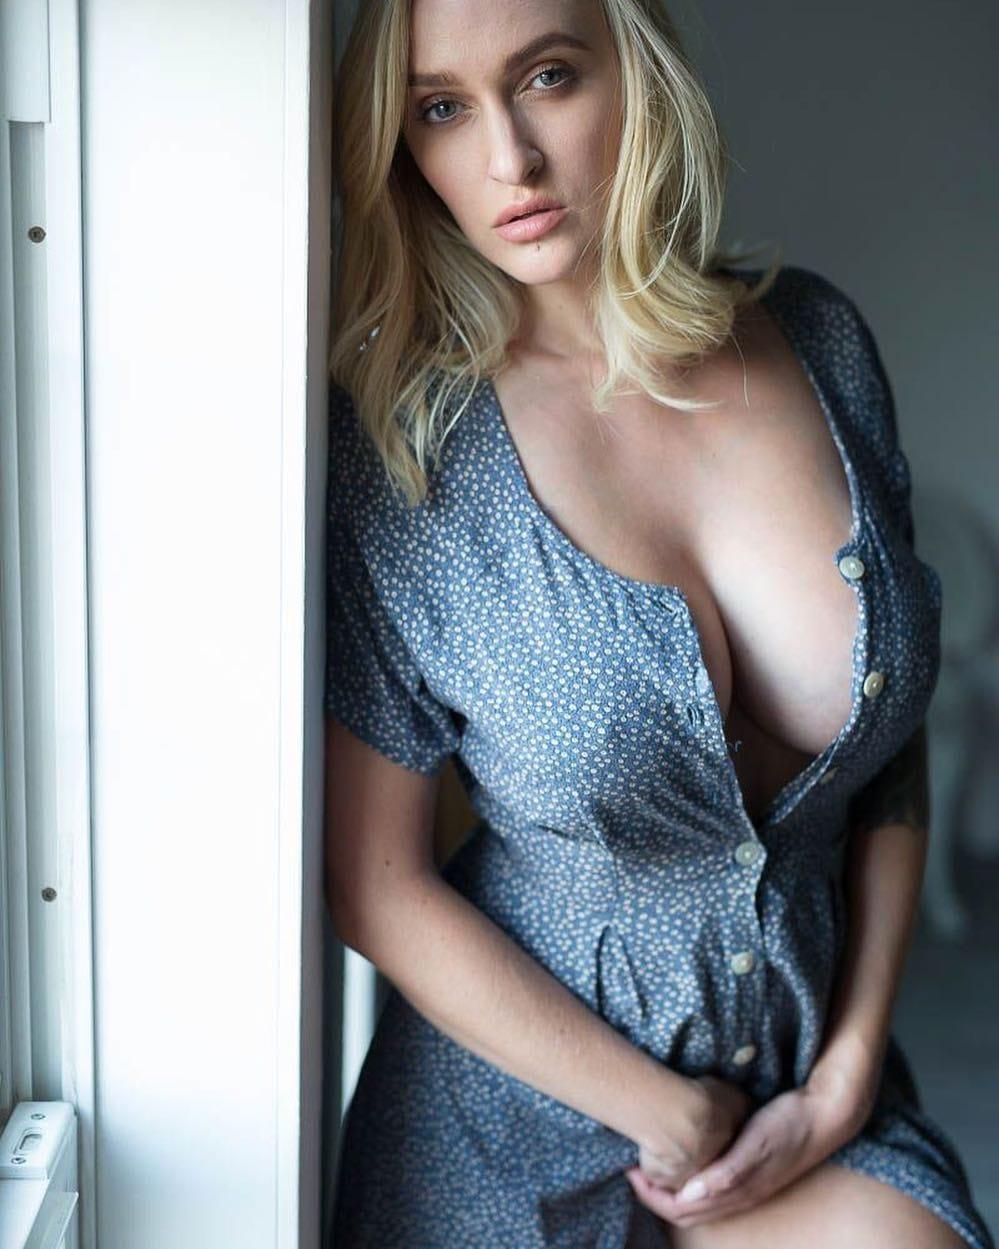 bra Images Alyssa Barbara naked photo 2017